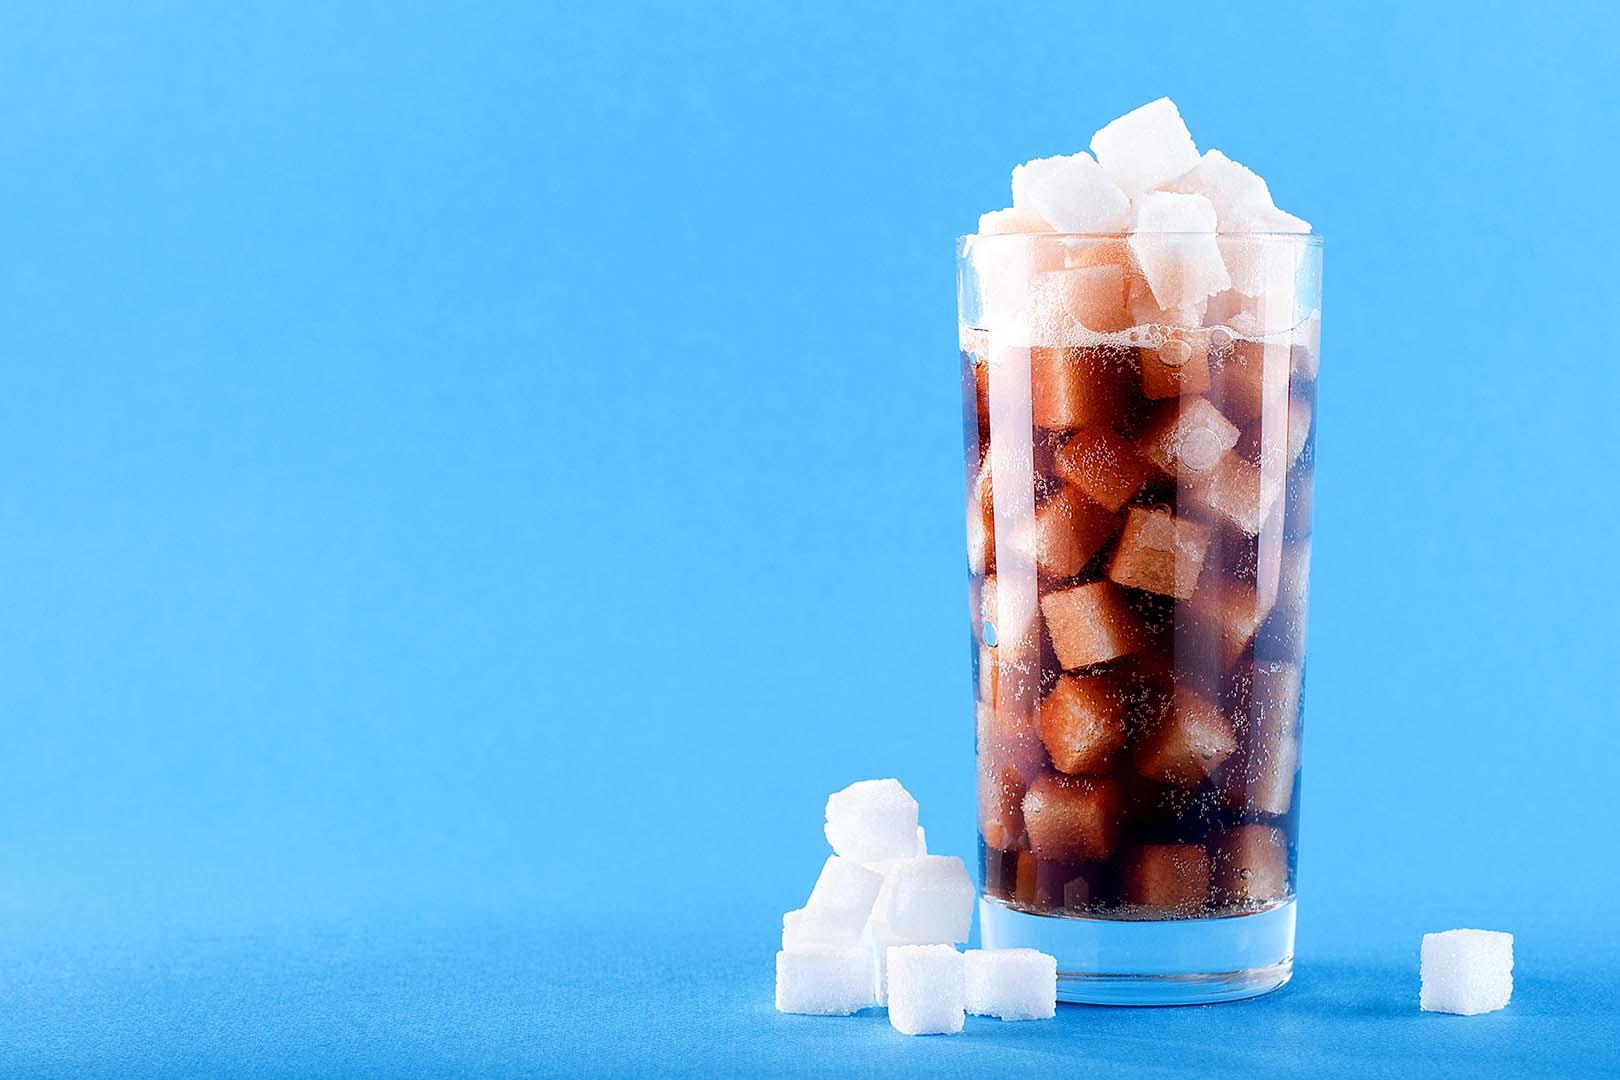 Waspadai Minuman dan Makanan Penyebab Kanker Mulut! - Lifepack